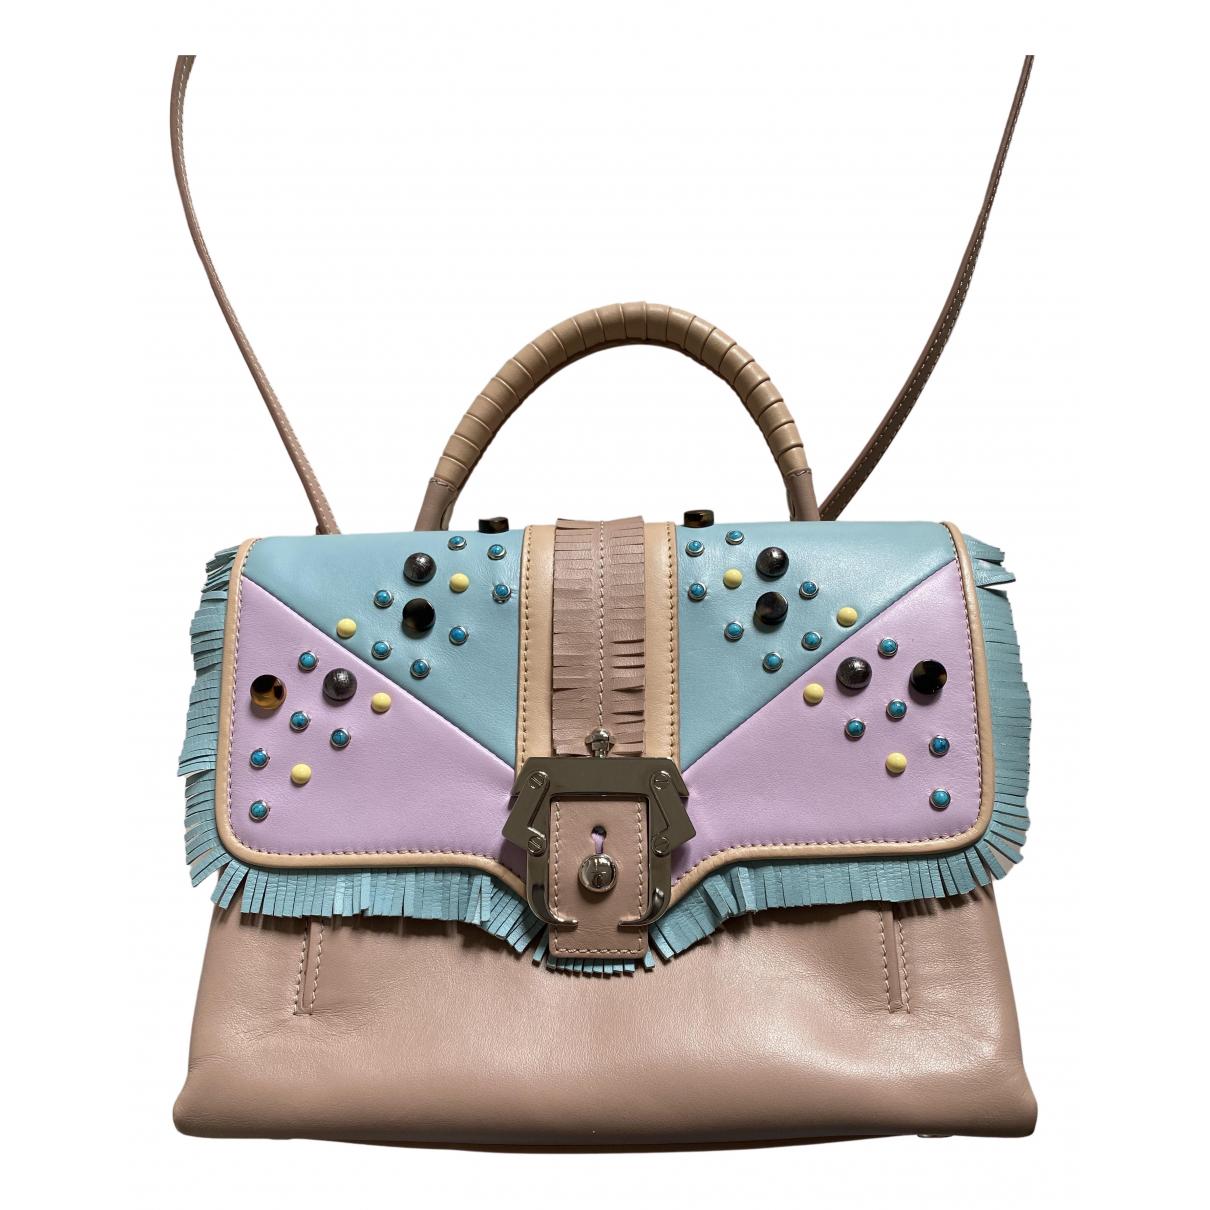 Paula Cademartori N Pink Leather handbag for Women N